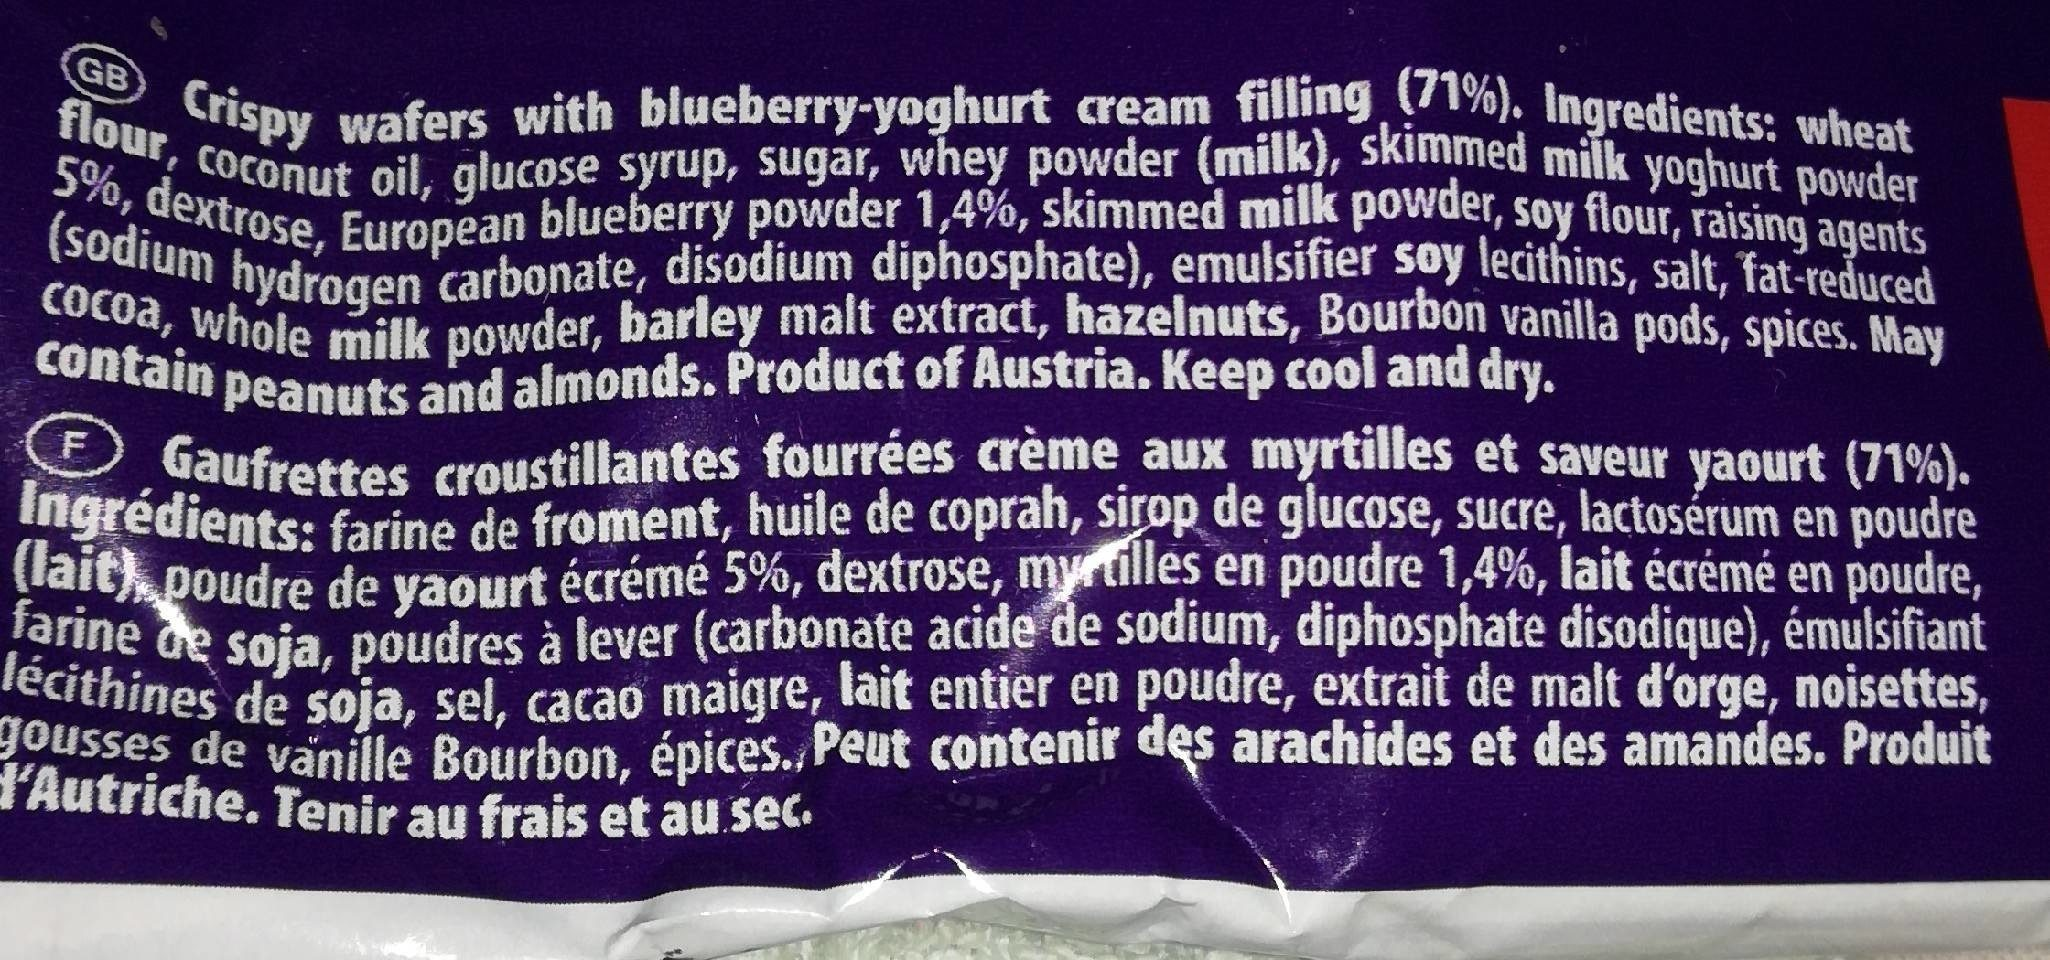 Blueberry yoghurt - Ingrédients - fr